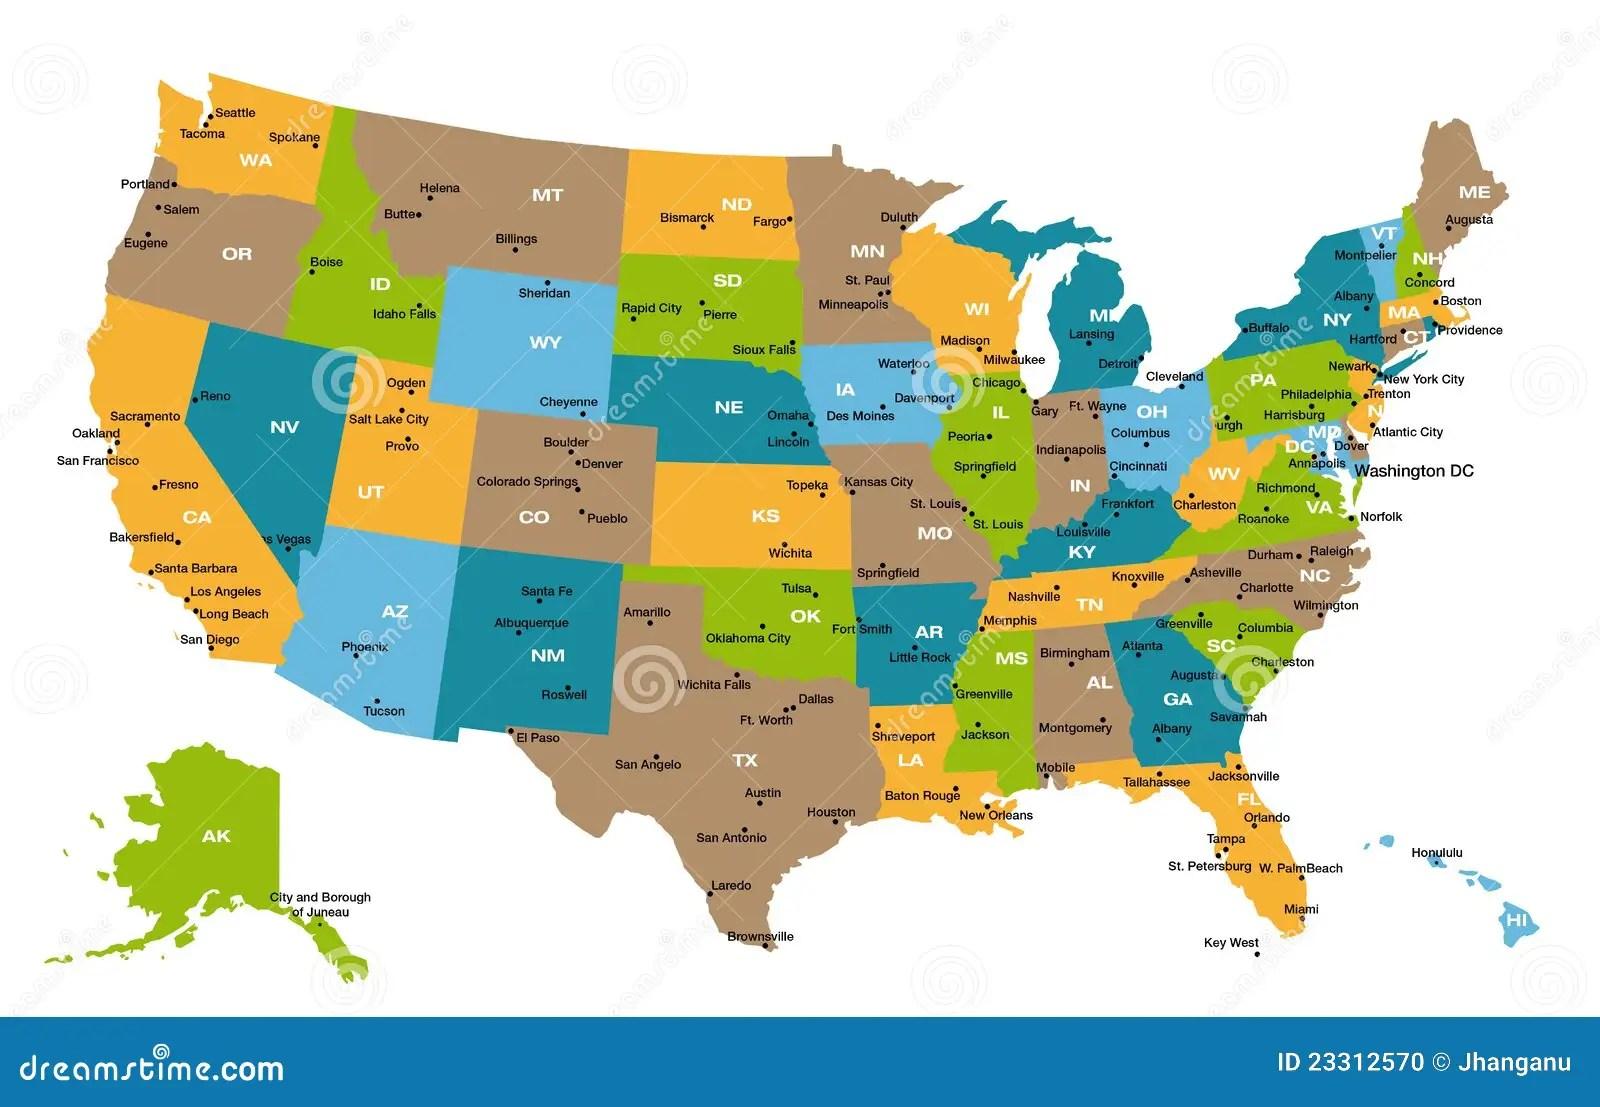 Usa States Abbreviations Map